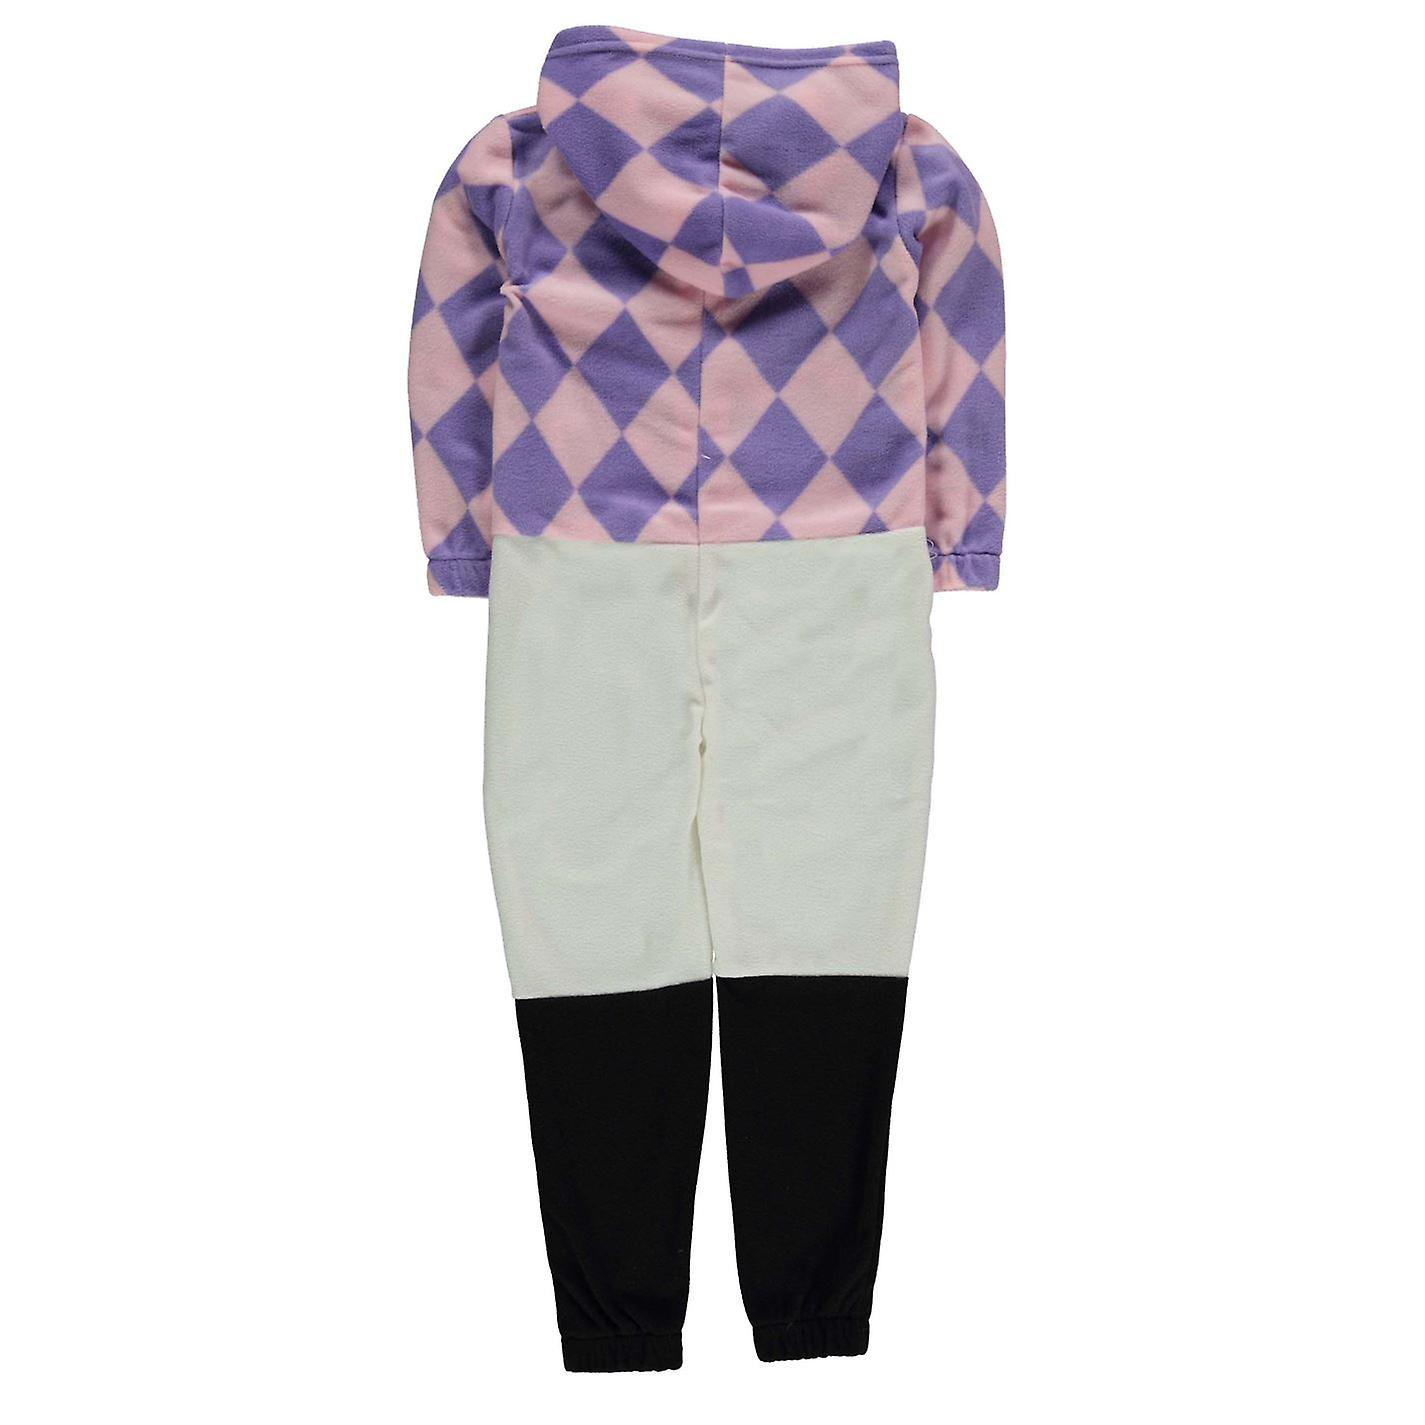 Jockey Kinder Mädchen Onesie Kind Pyjama Set Kapuzen Zip elastische Manschetten